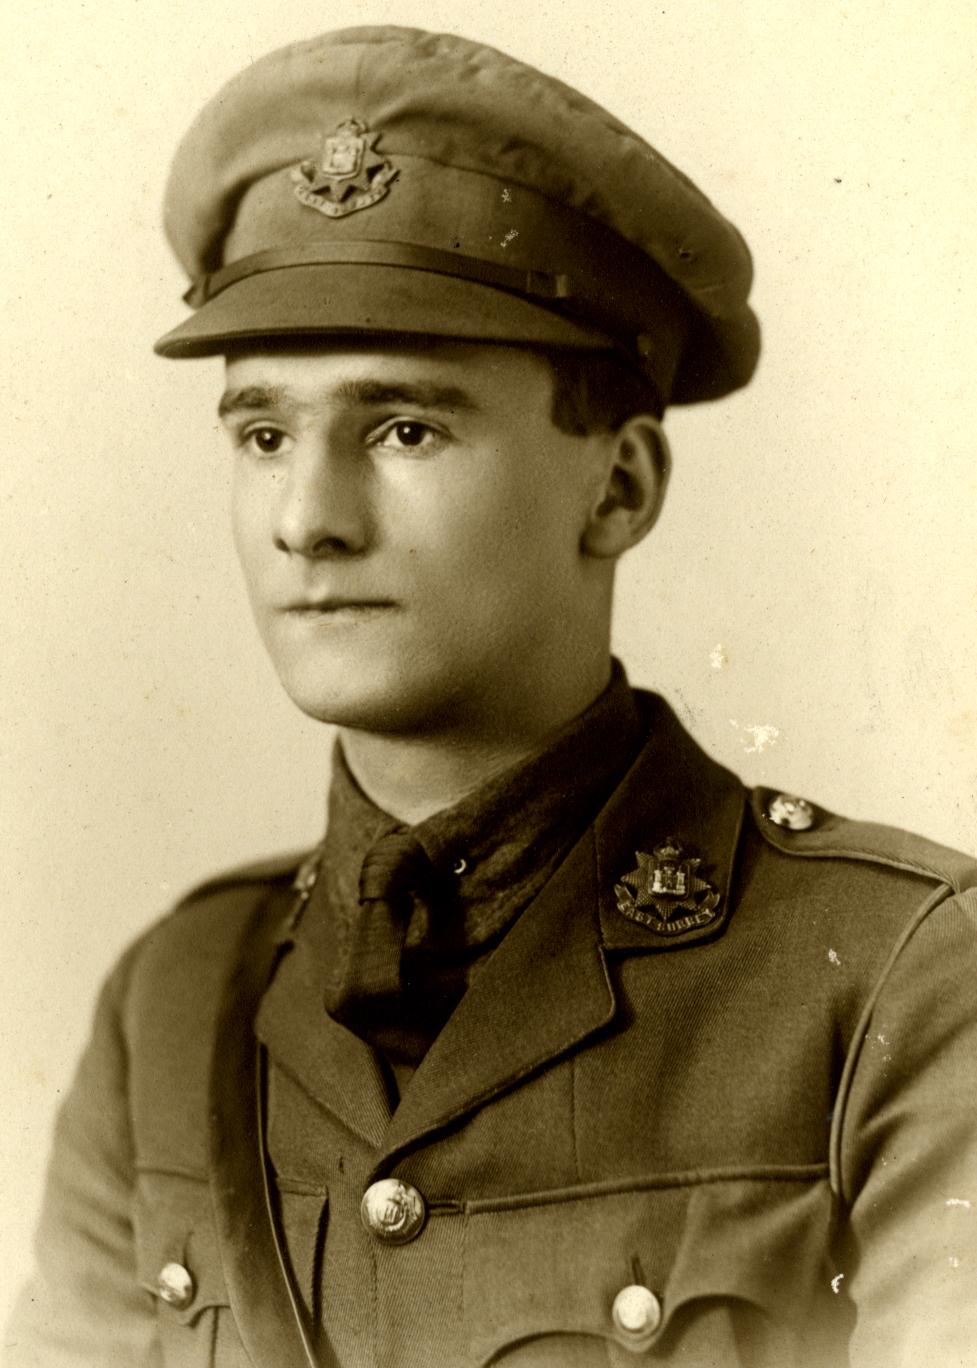 Sherriff wearing his East Surrey Regiment uniform, c.1917 . By permission of Kingston Grammar School and Surrey History Centre.